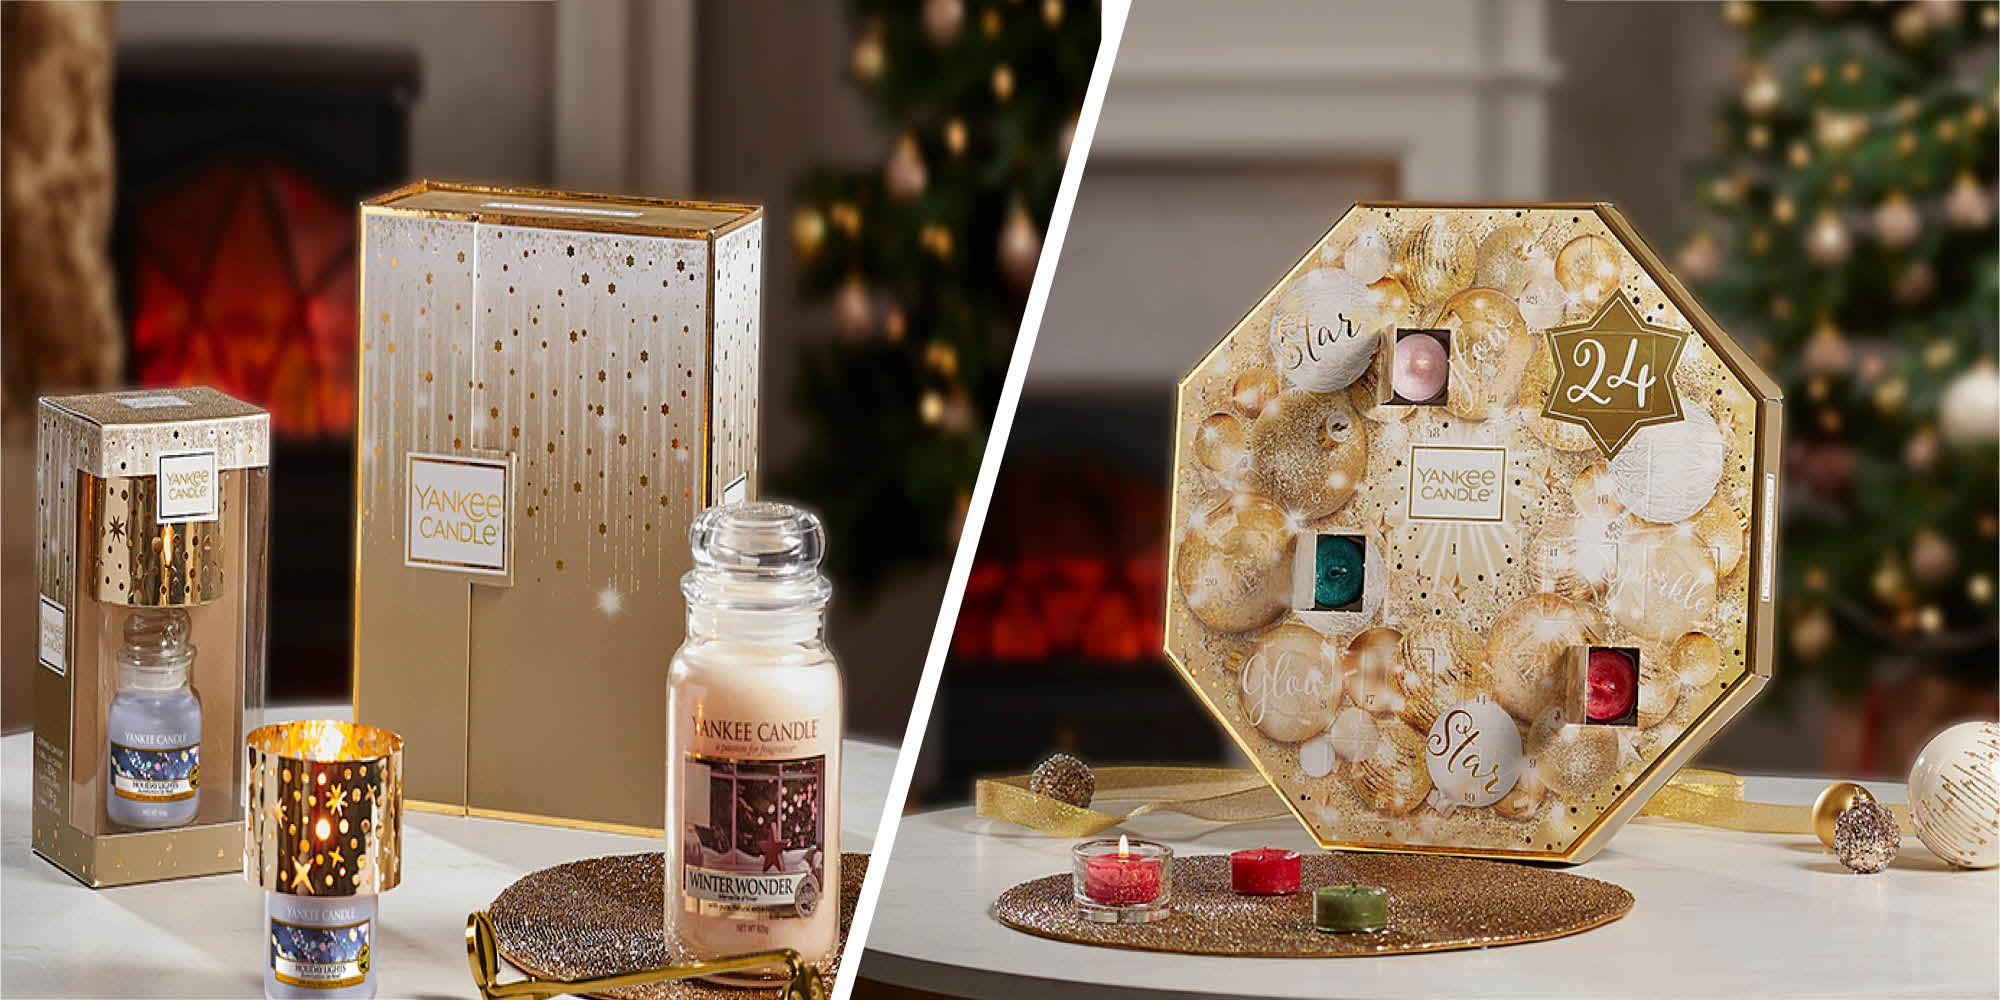 Yankee candle christmas gift sets 2019